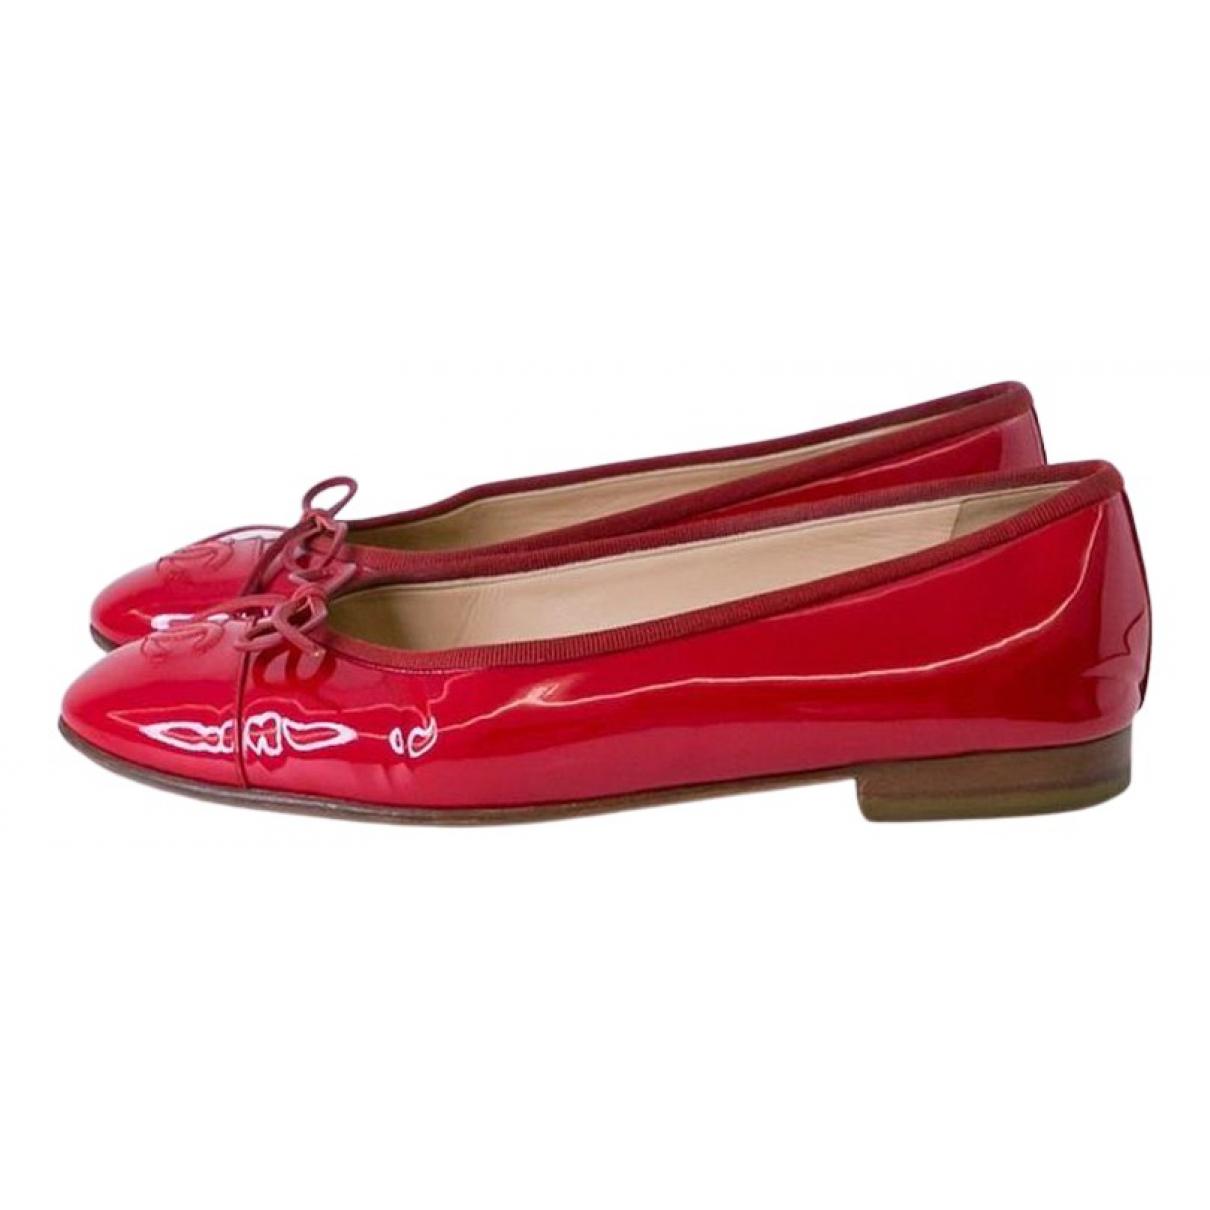 Chanel \N Ballerinas in  Rot Lackleder